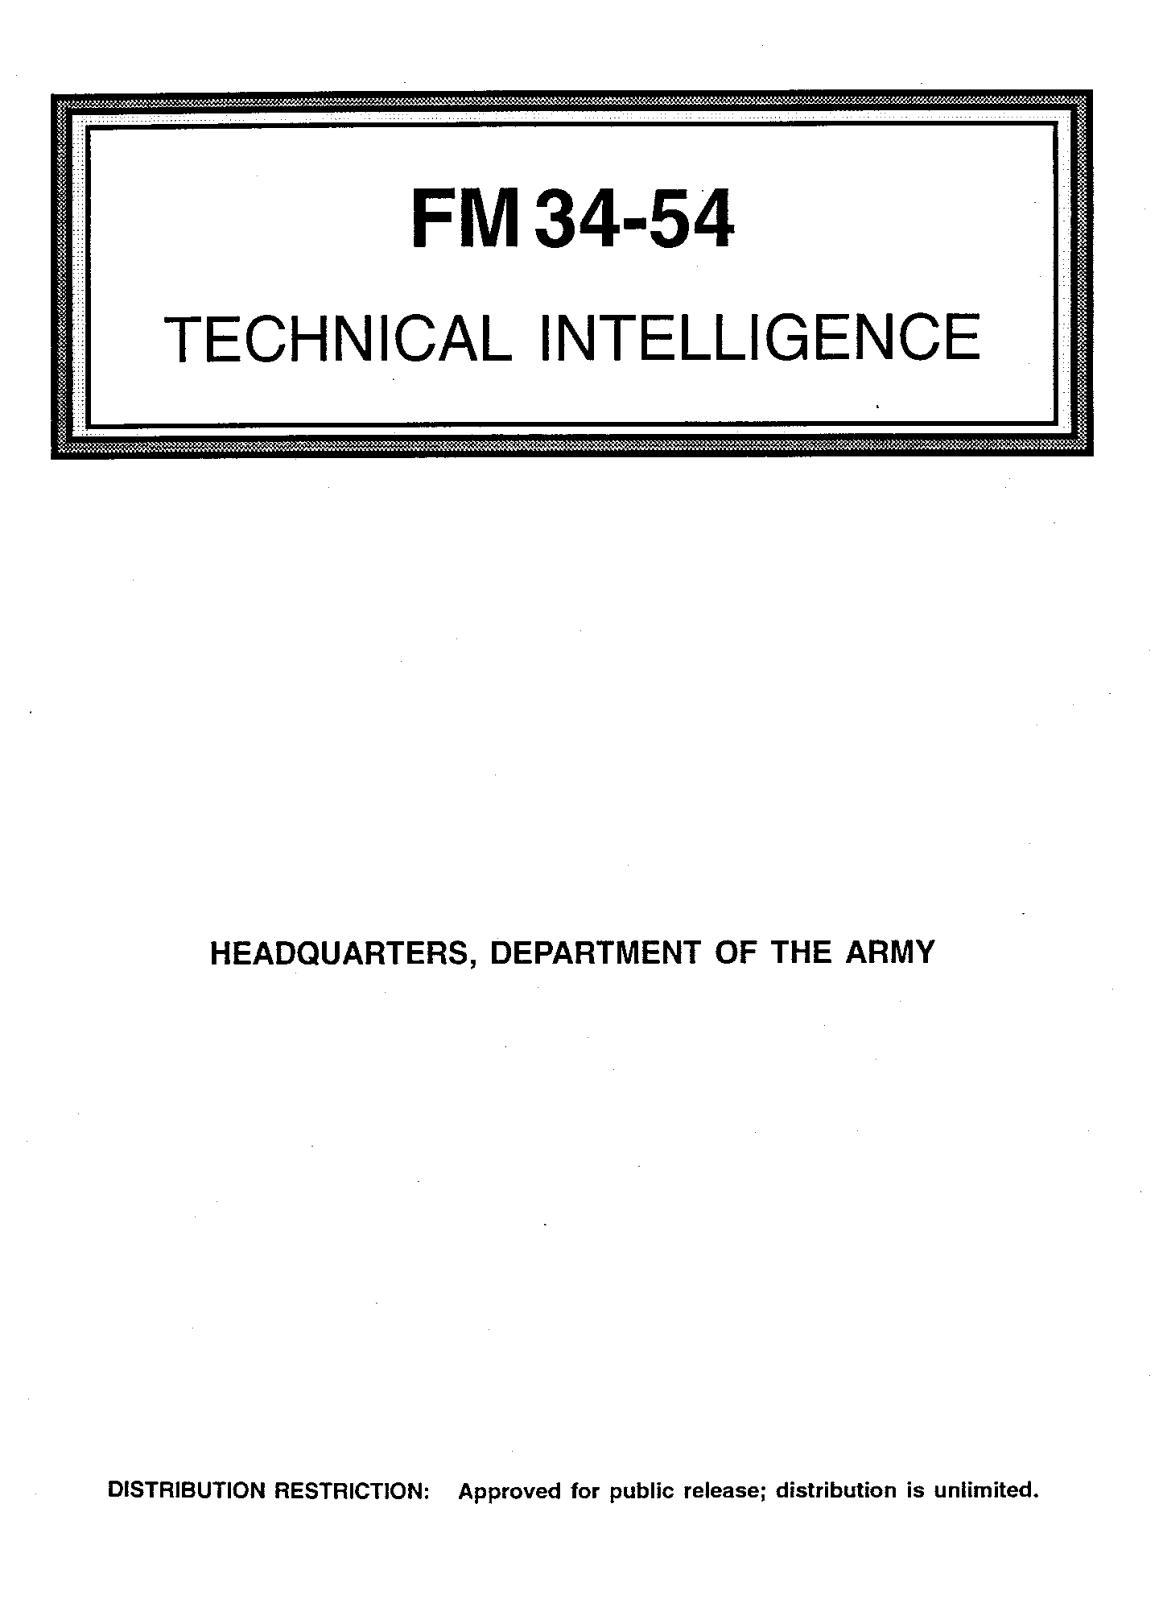 Calaméo - (e Book - English - Military) US Army - Field